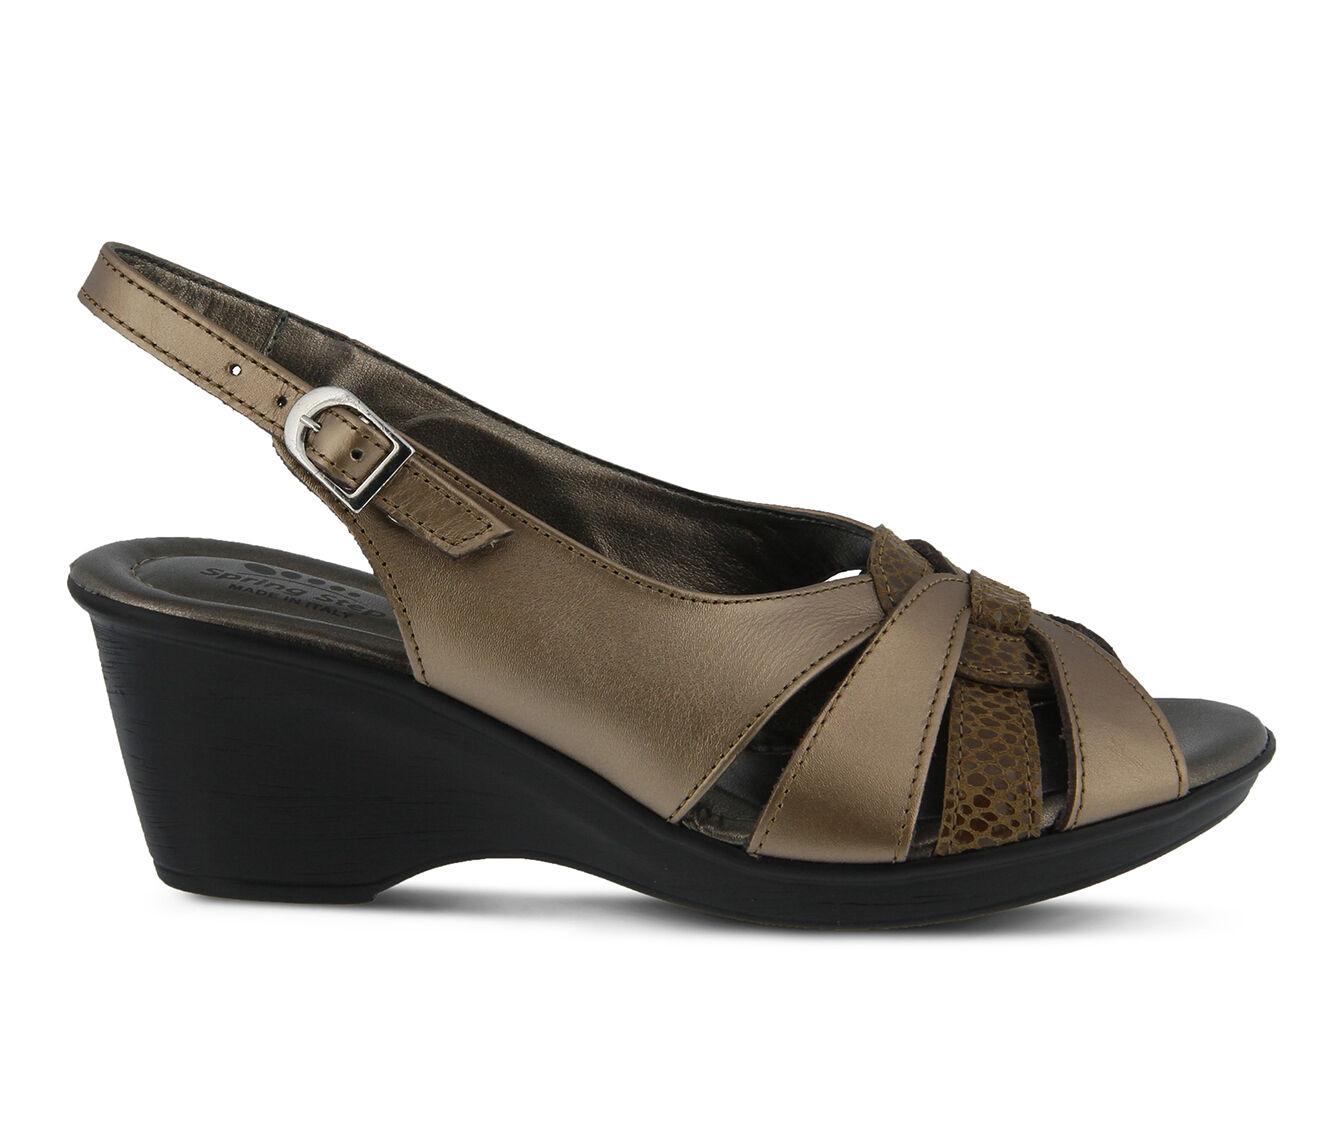 buyt new Women's SPRING STEP Adorable Dress Sandals Bronze